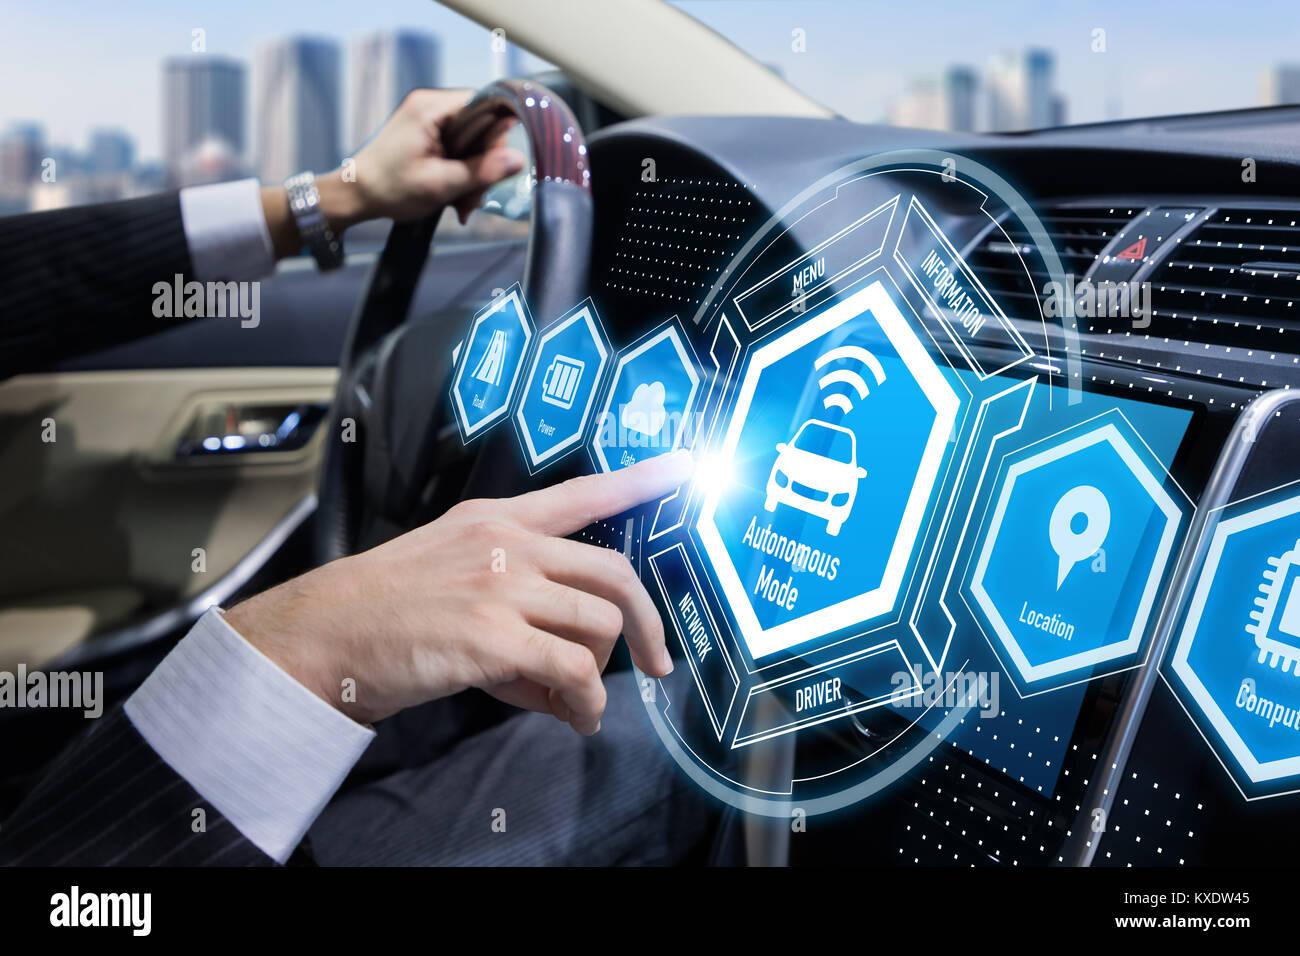 Interior of autonomous car. Self driving vehicle. Driverless car. - Stock Image